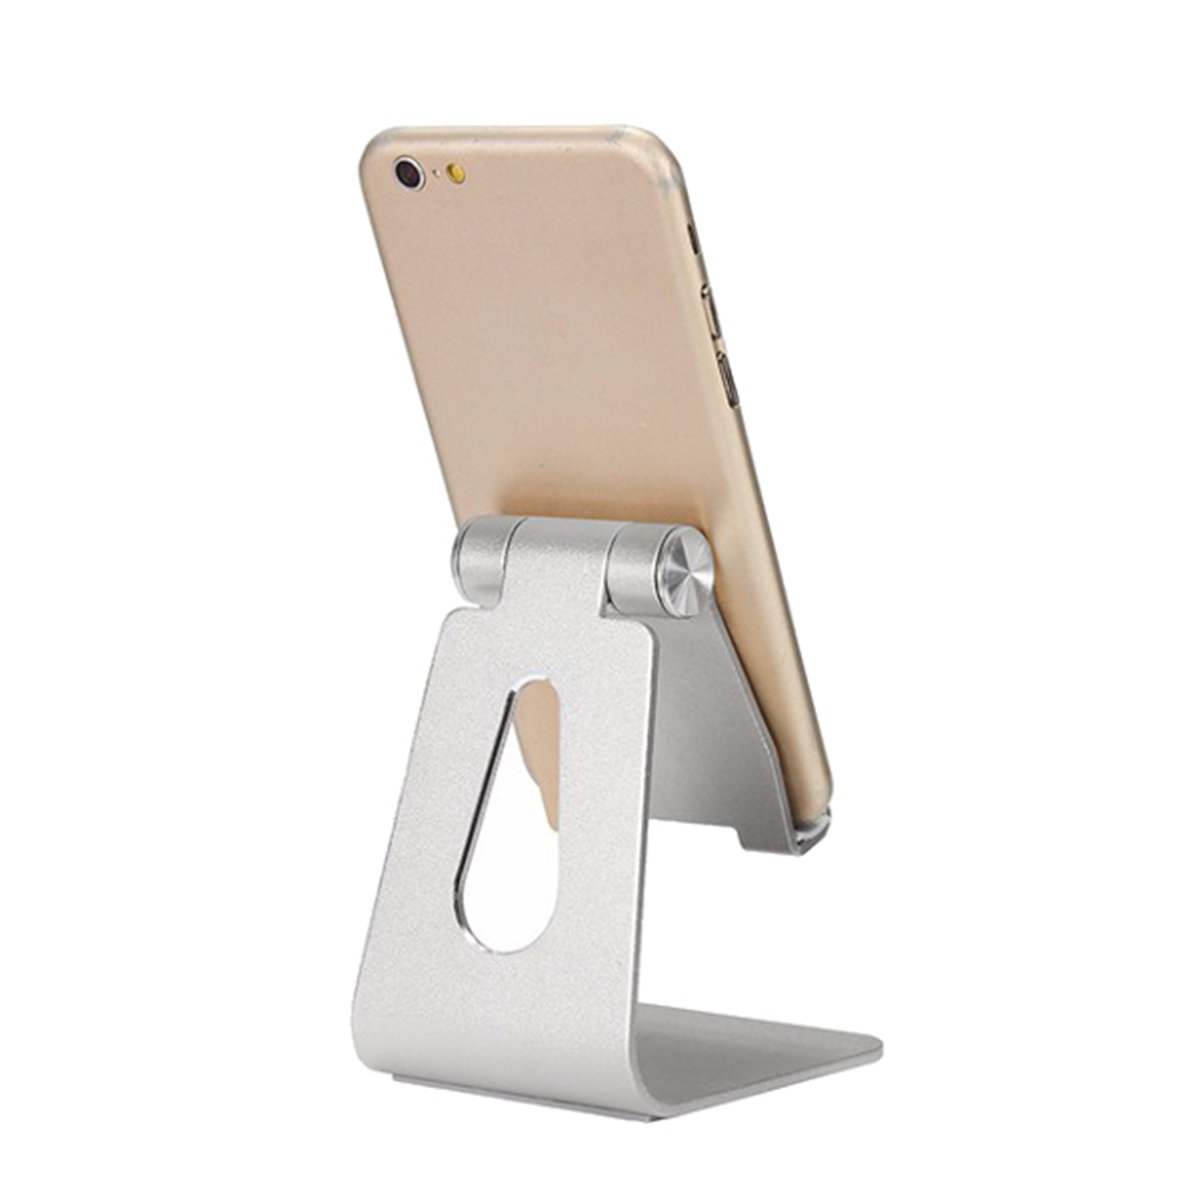 Aluminum Alloy Adjustable Anti-slip Desktop Stand Charging Holder for iPad Phone Tablet